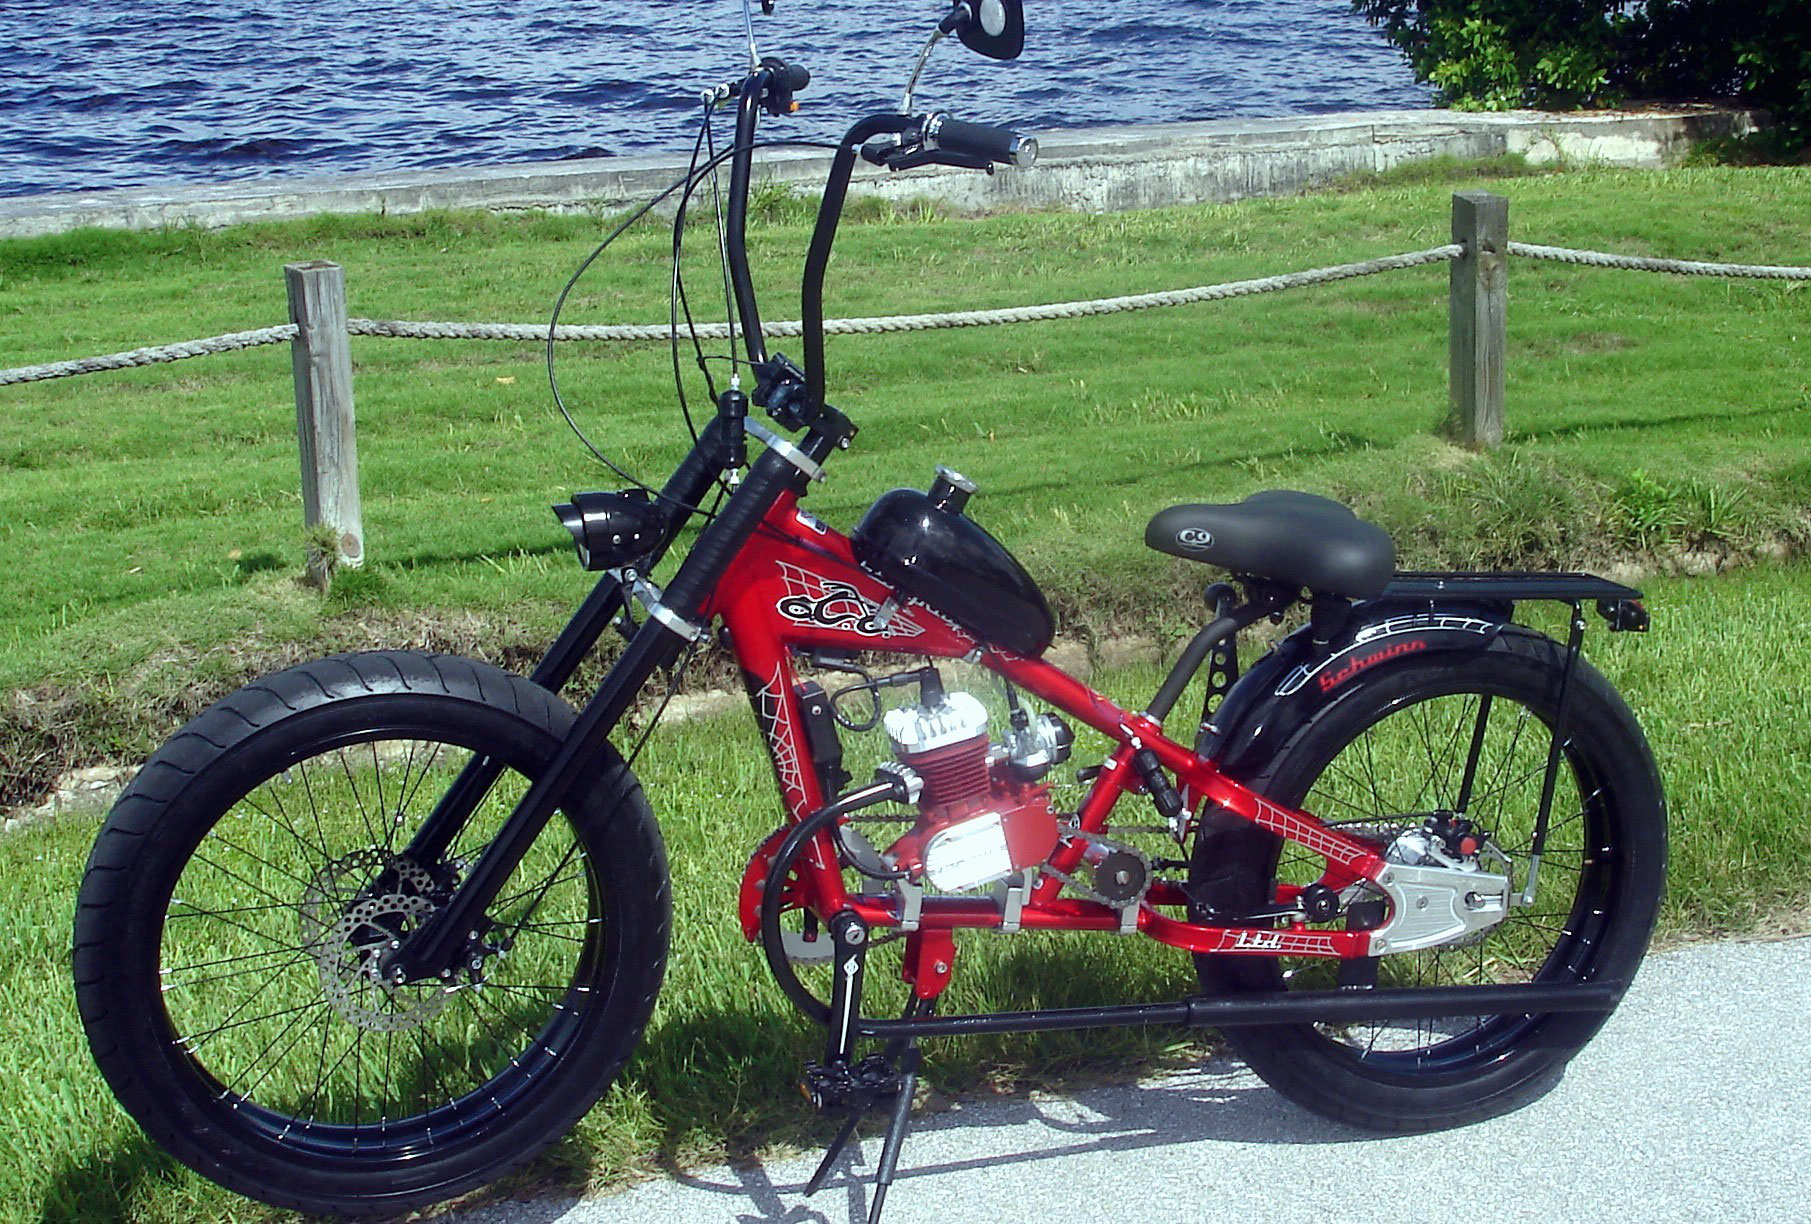 Web Theme Bike With All Upgrades Pedalchopper